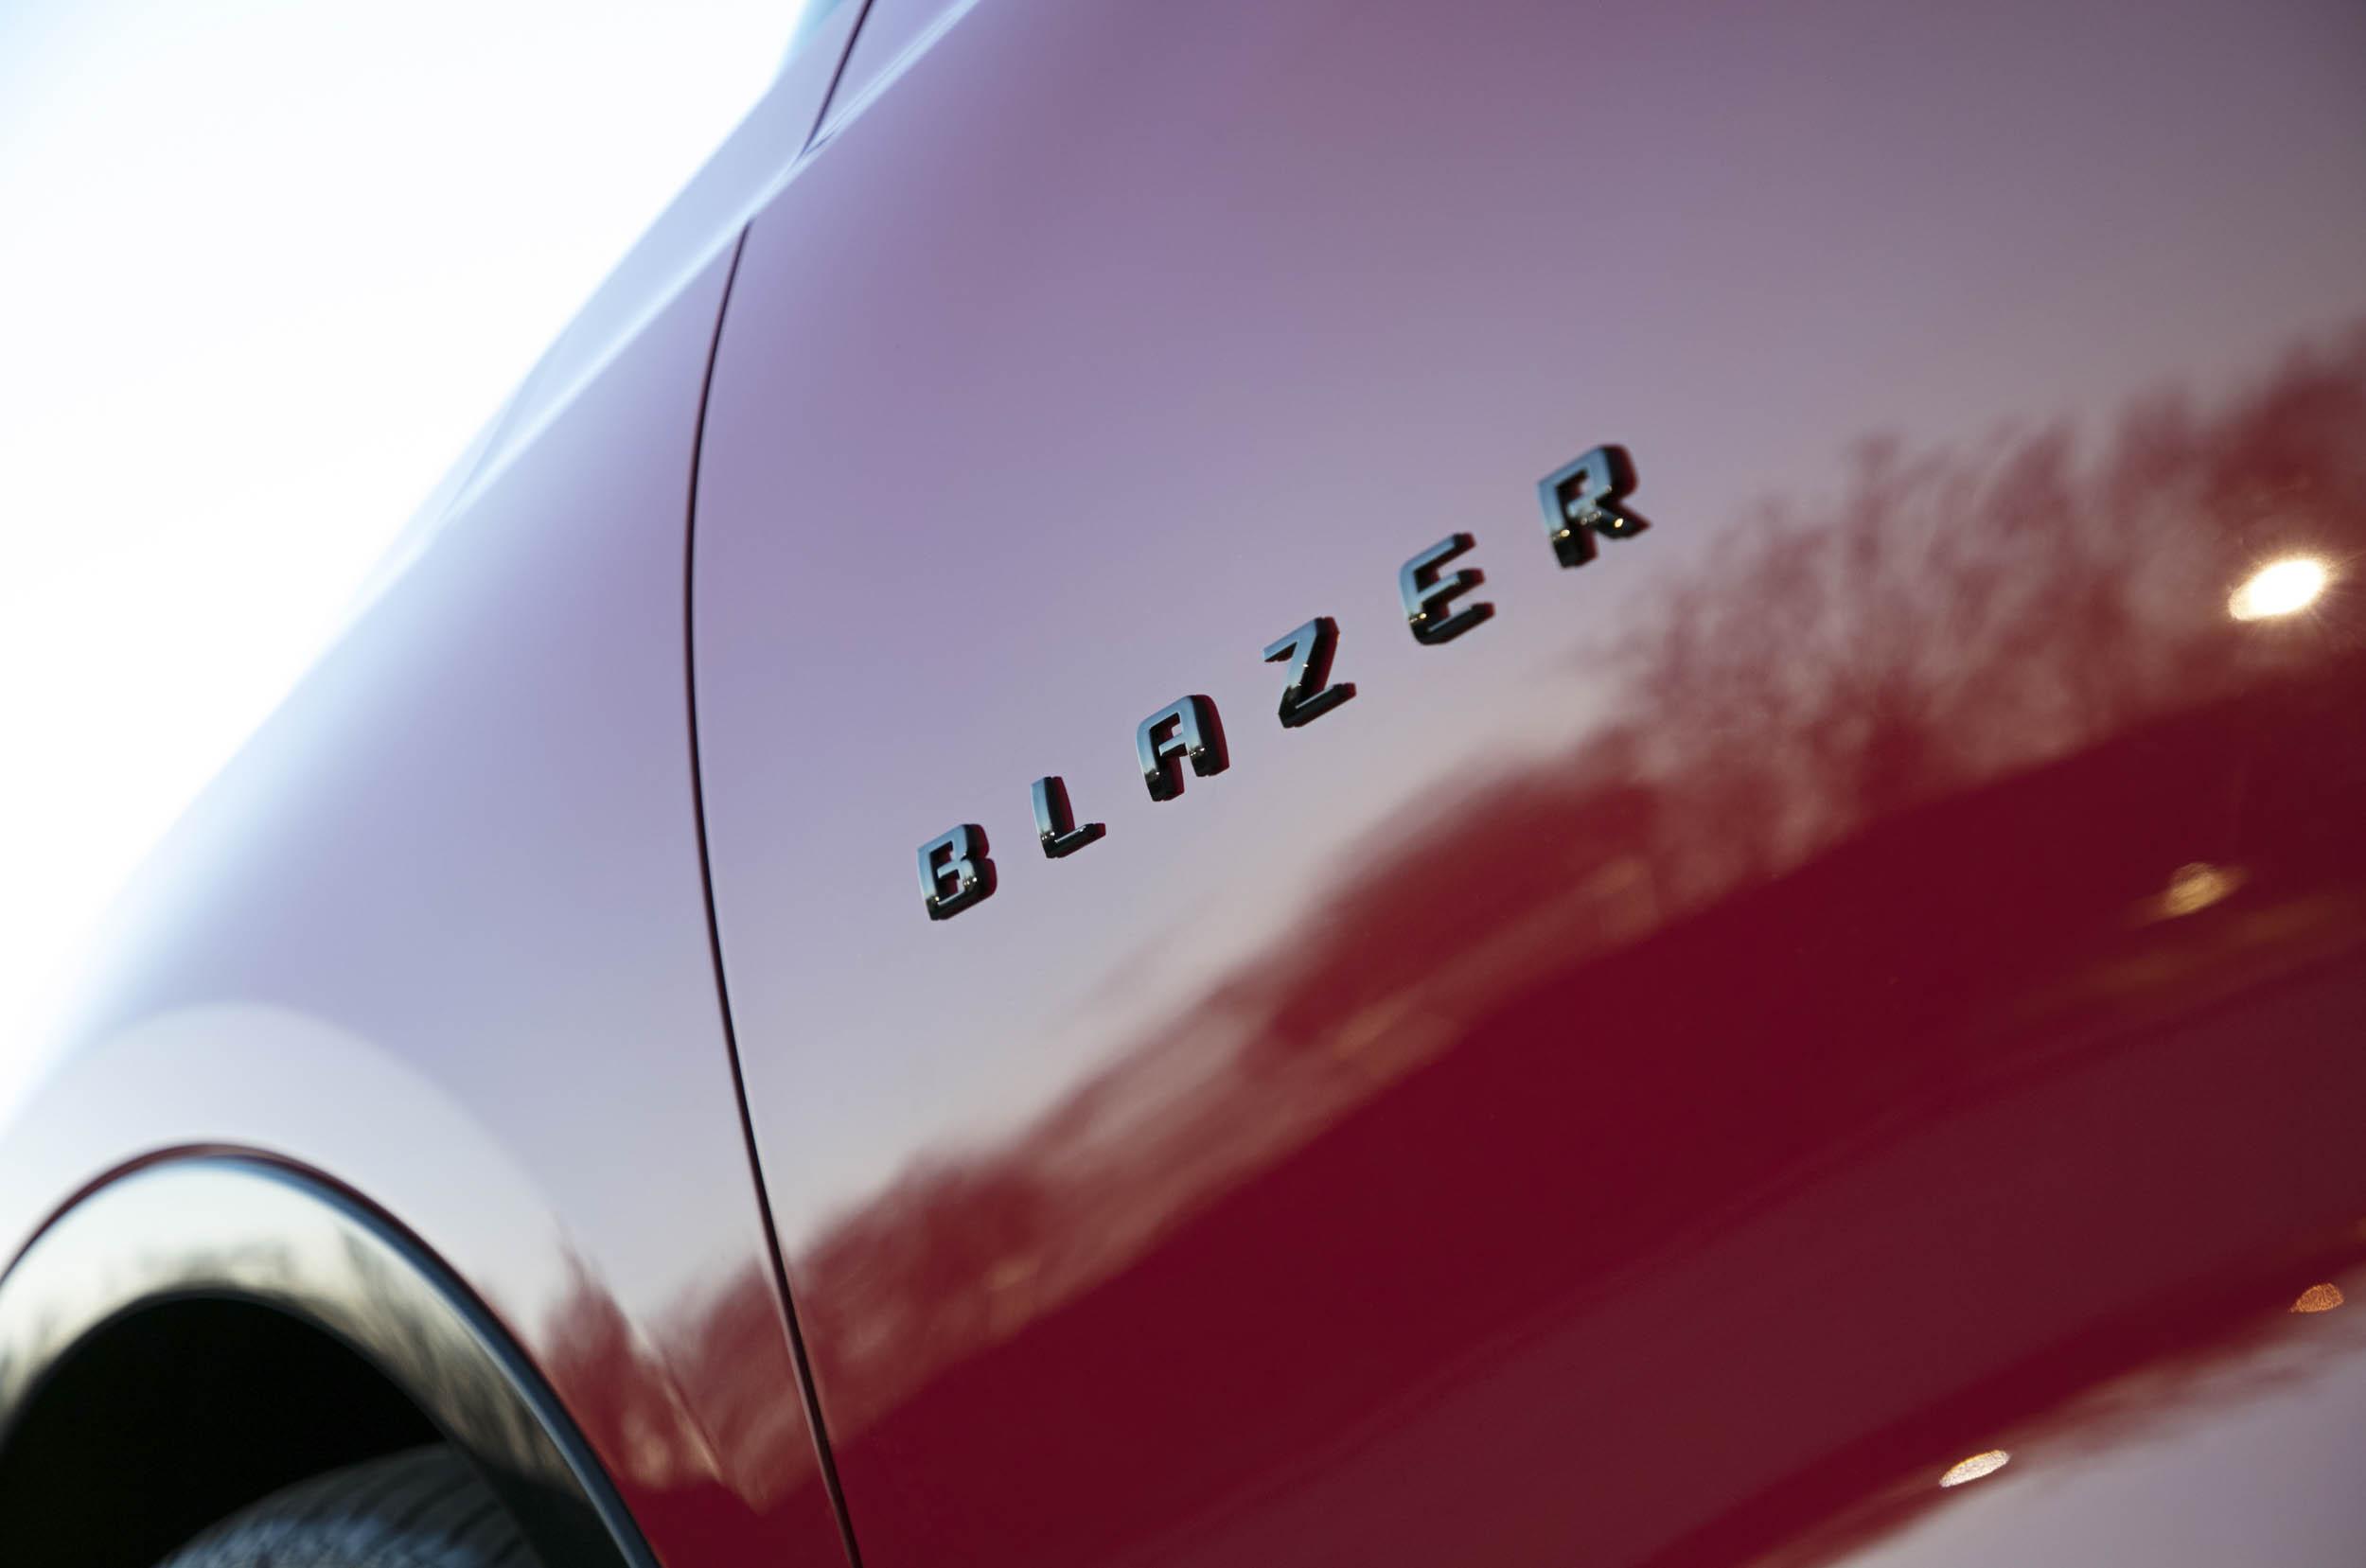 2019 Chevrolet Blazer badge detail